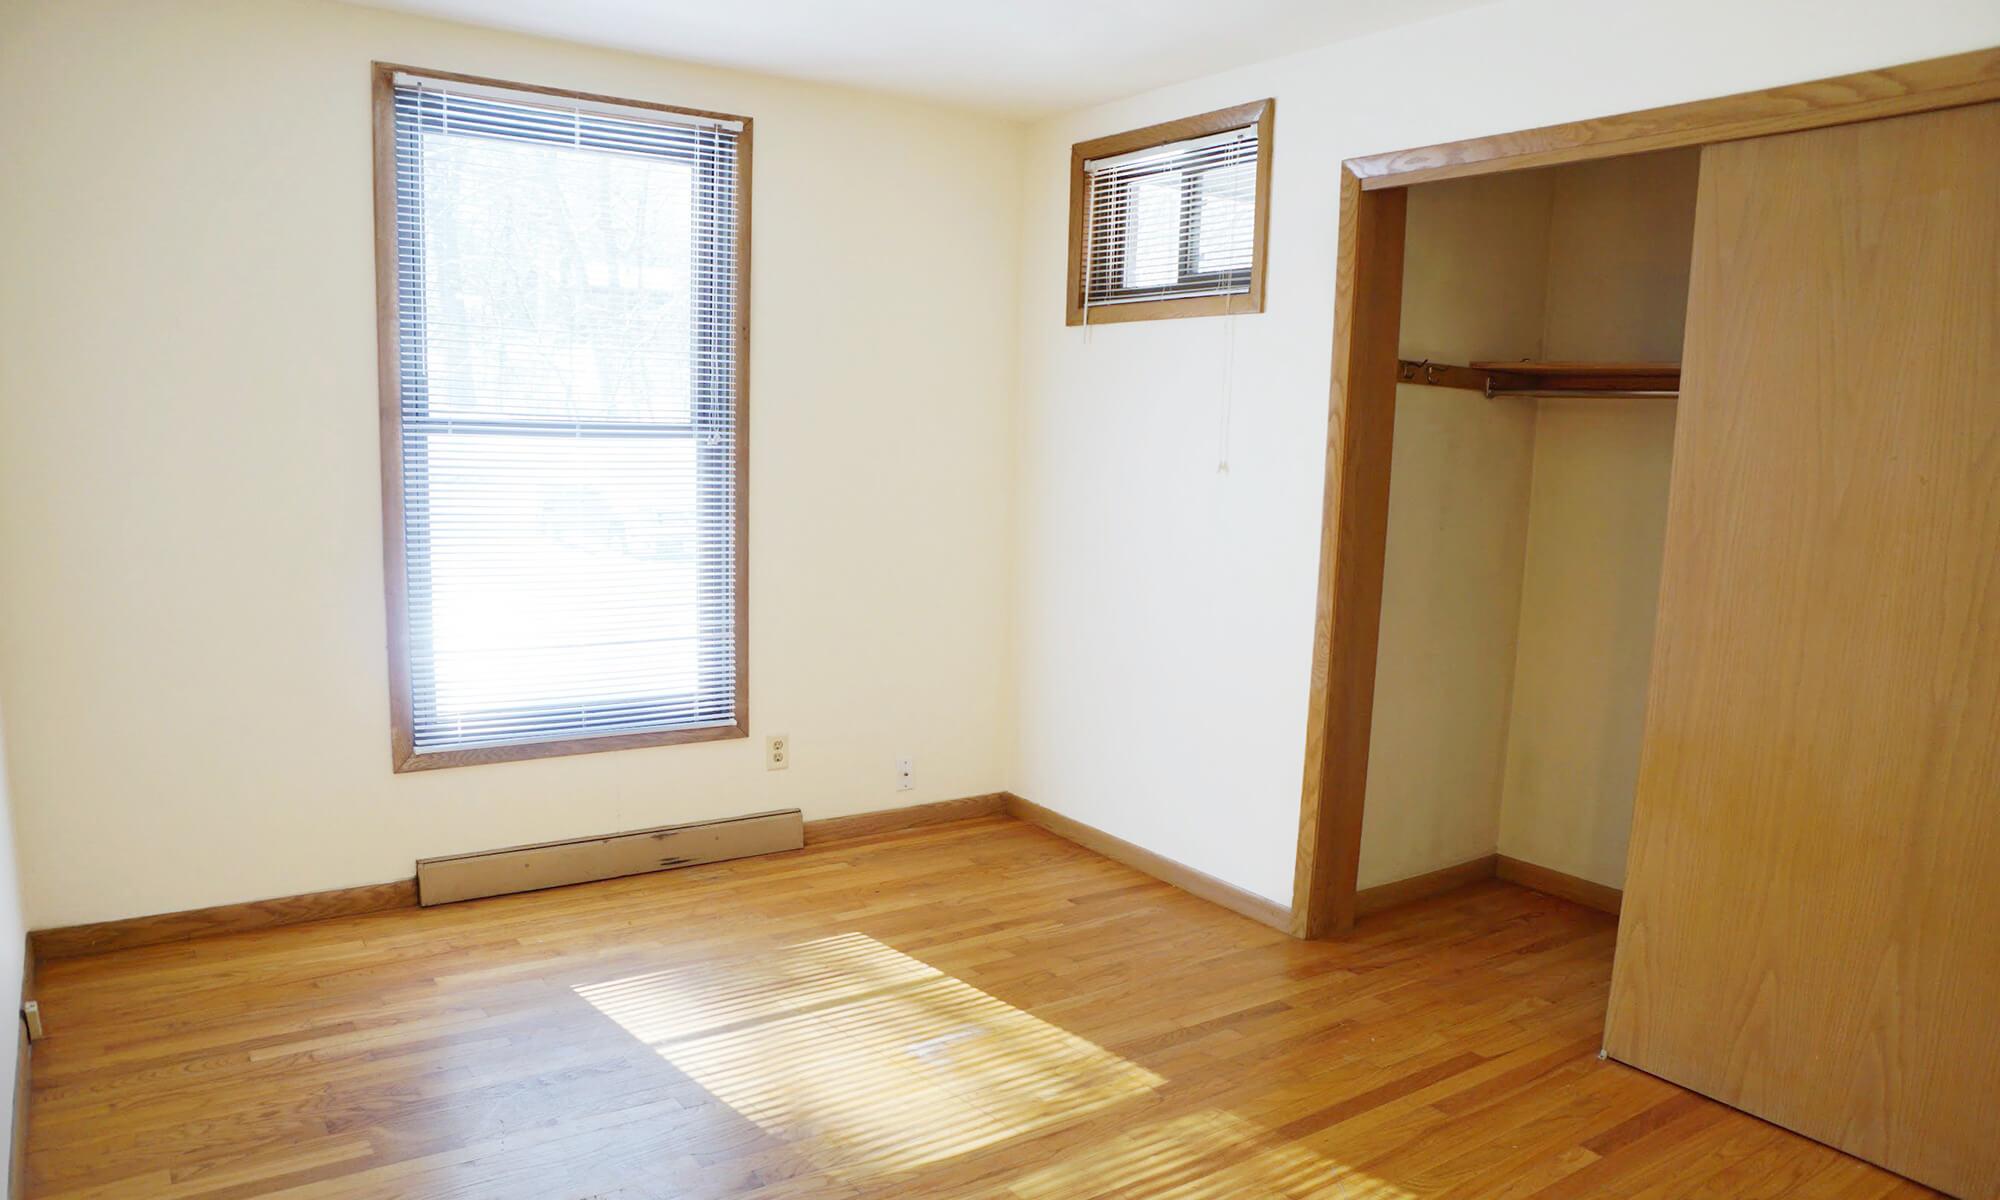 2B 1B Bedroom 1 (2)